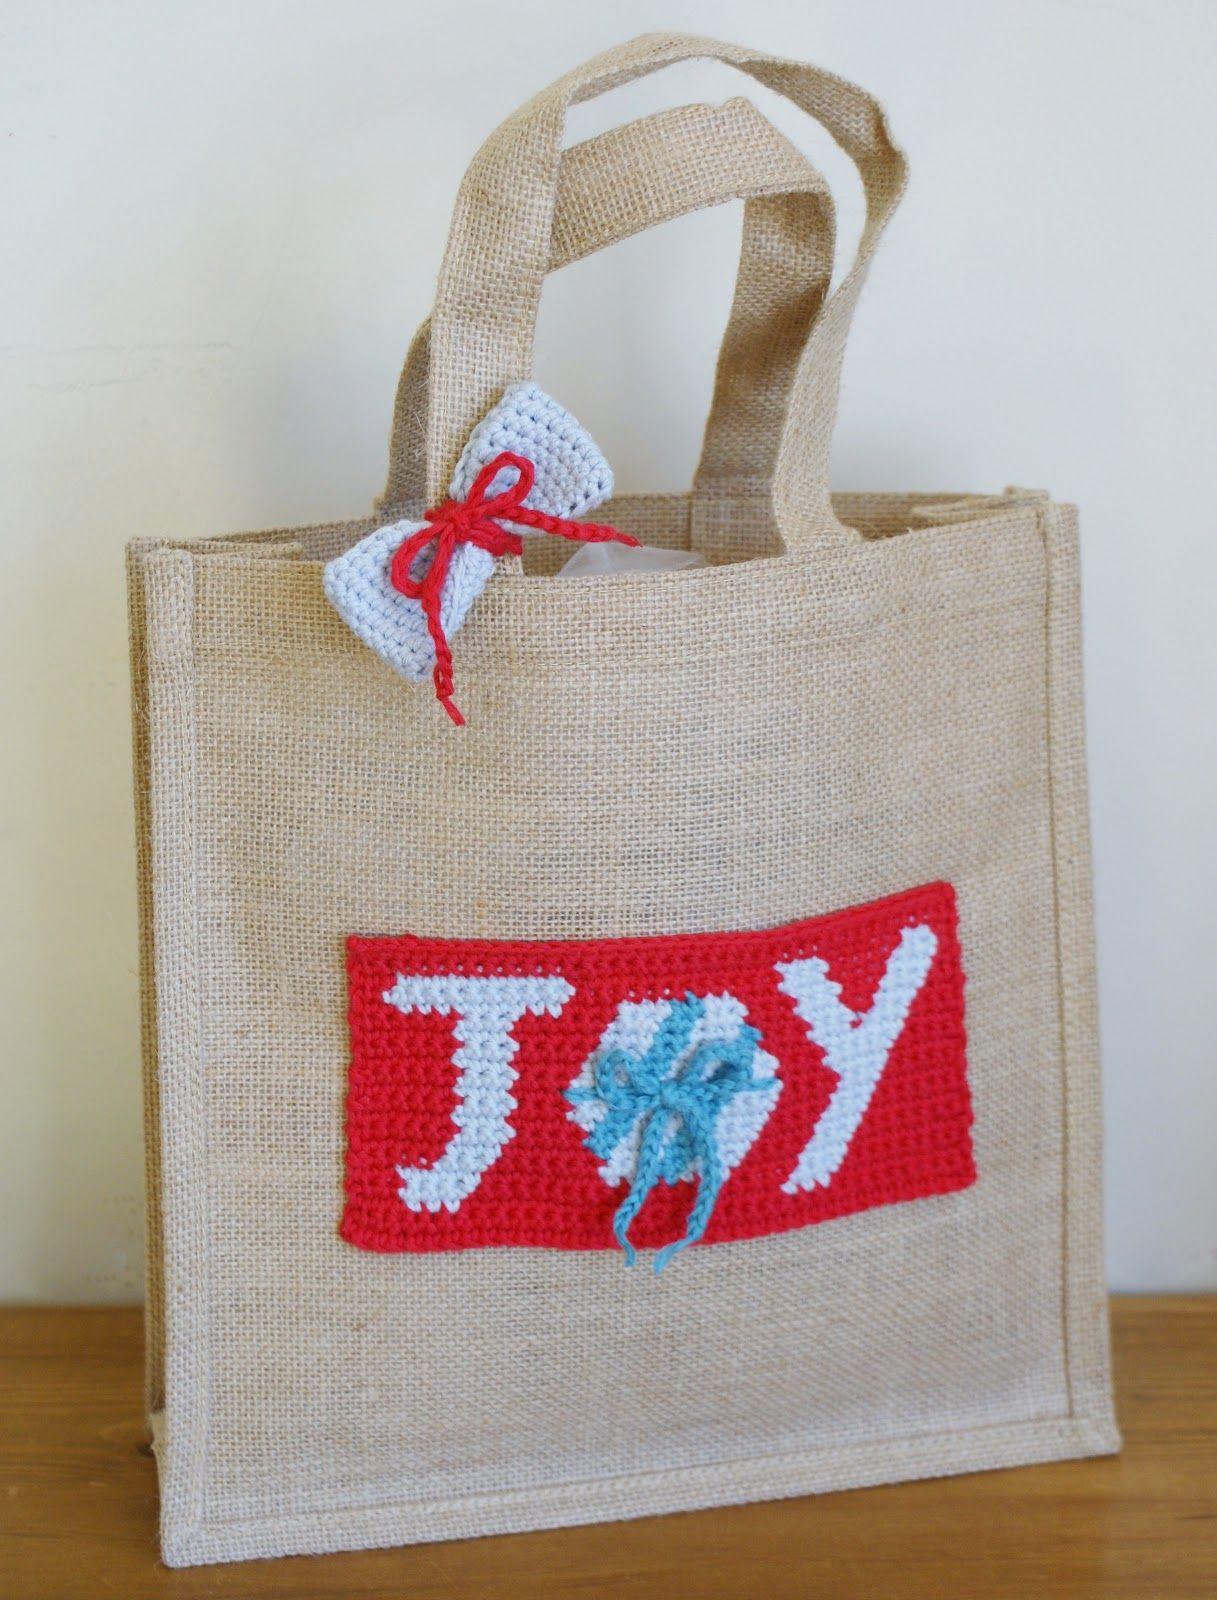 Joy gift bag free holiday crochet pattern crochetholic joy gift bag free holiday crochet pattern bankloansurffo Gallery